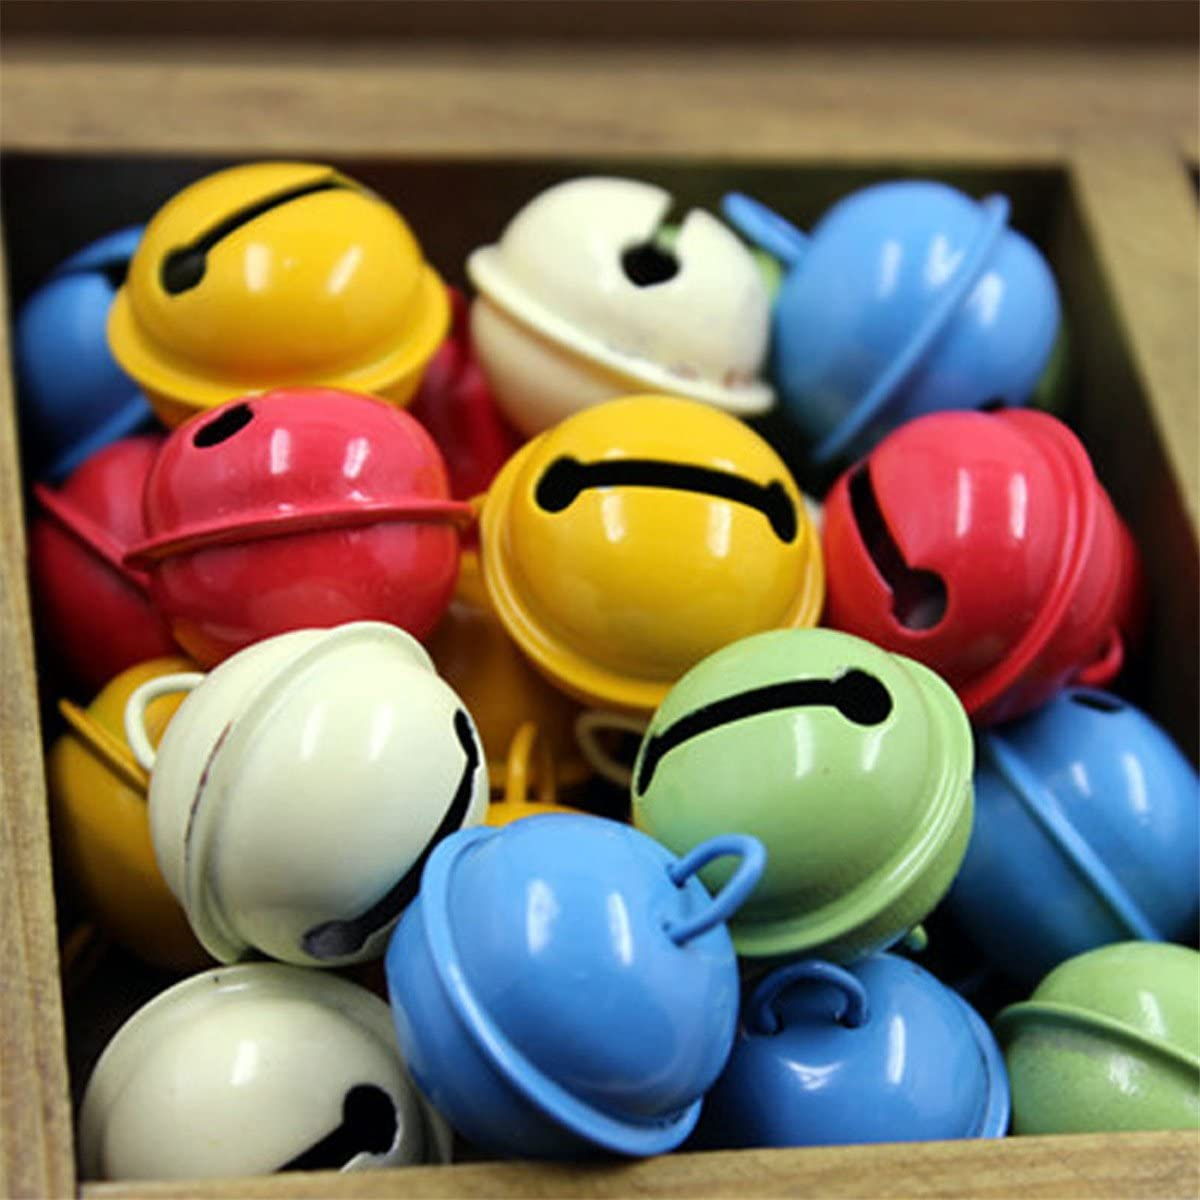 22mm ECYC 20Pcs Colorful Jingle Bell DIY Crafts Loose Beads Bells Christmas Decor